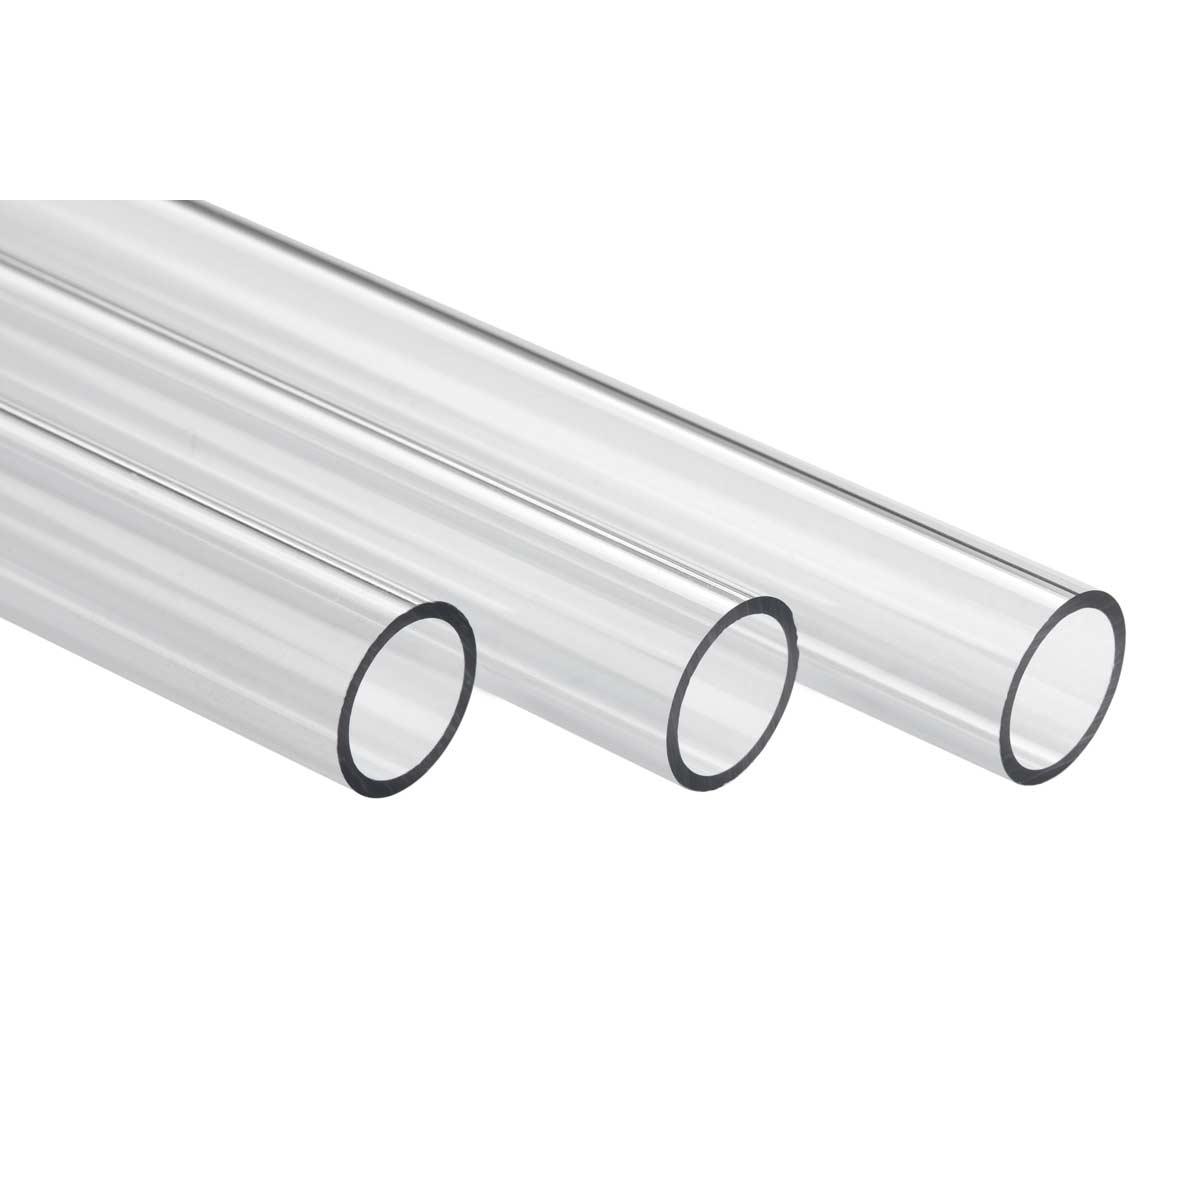 Tube rigide Corsair Hydro X XT Hardline